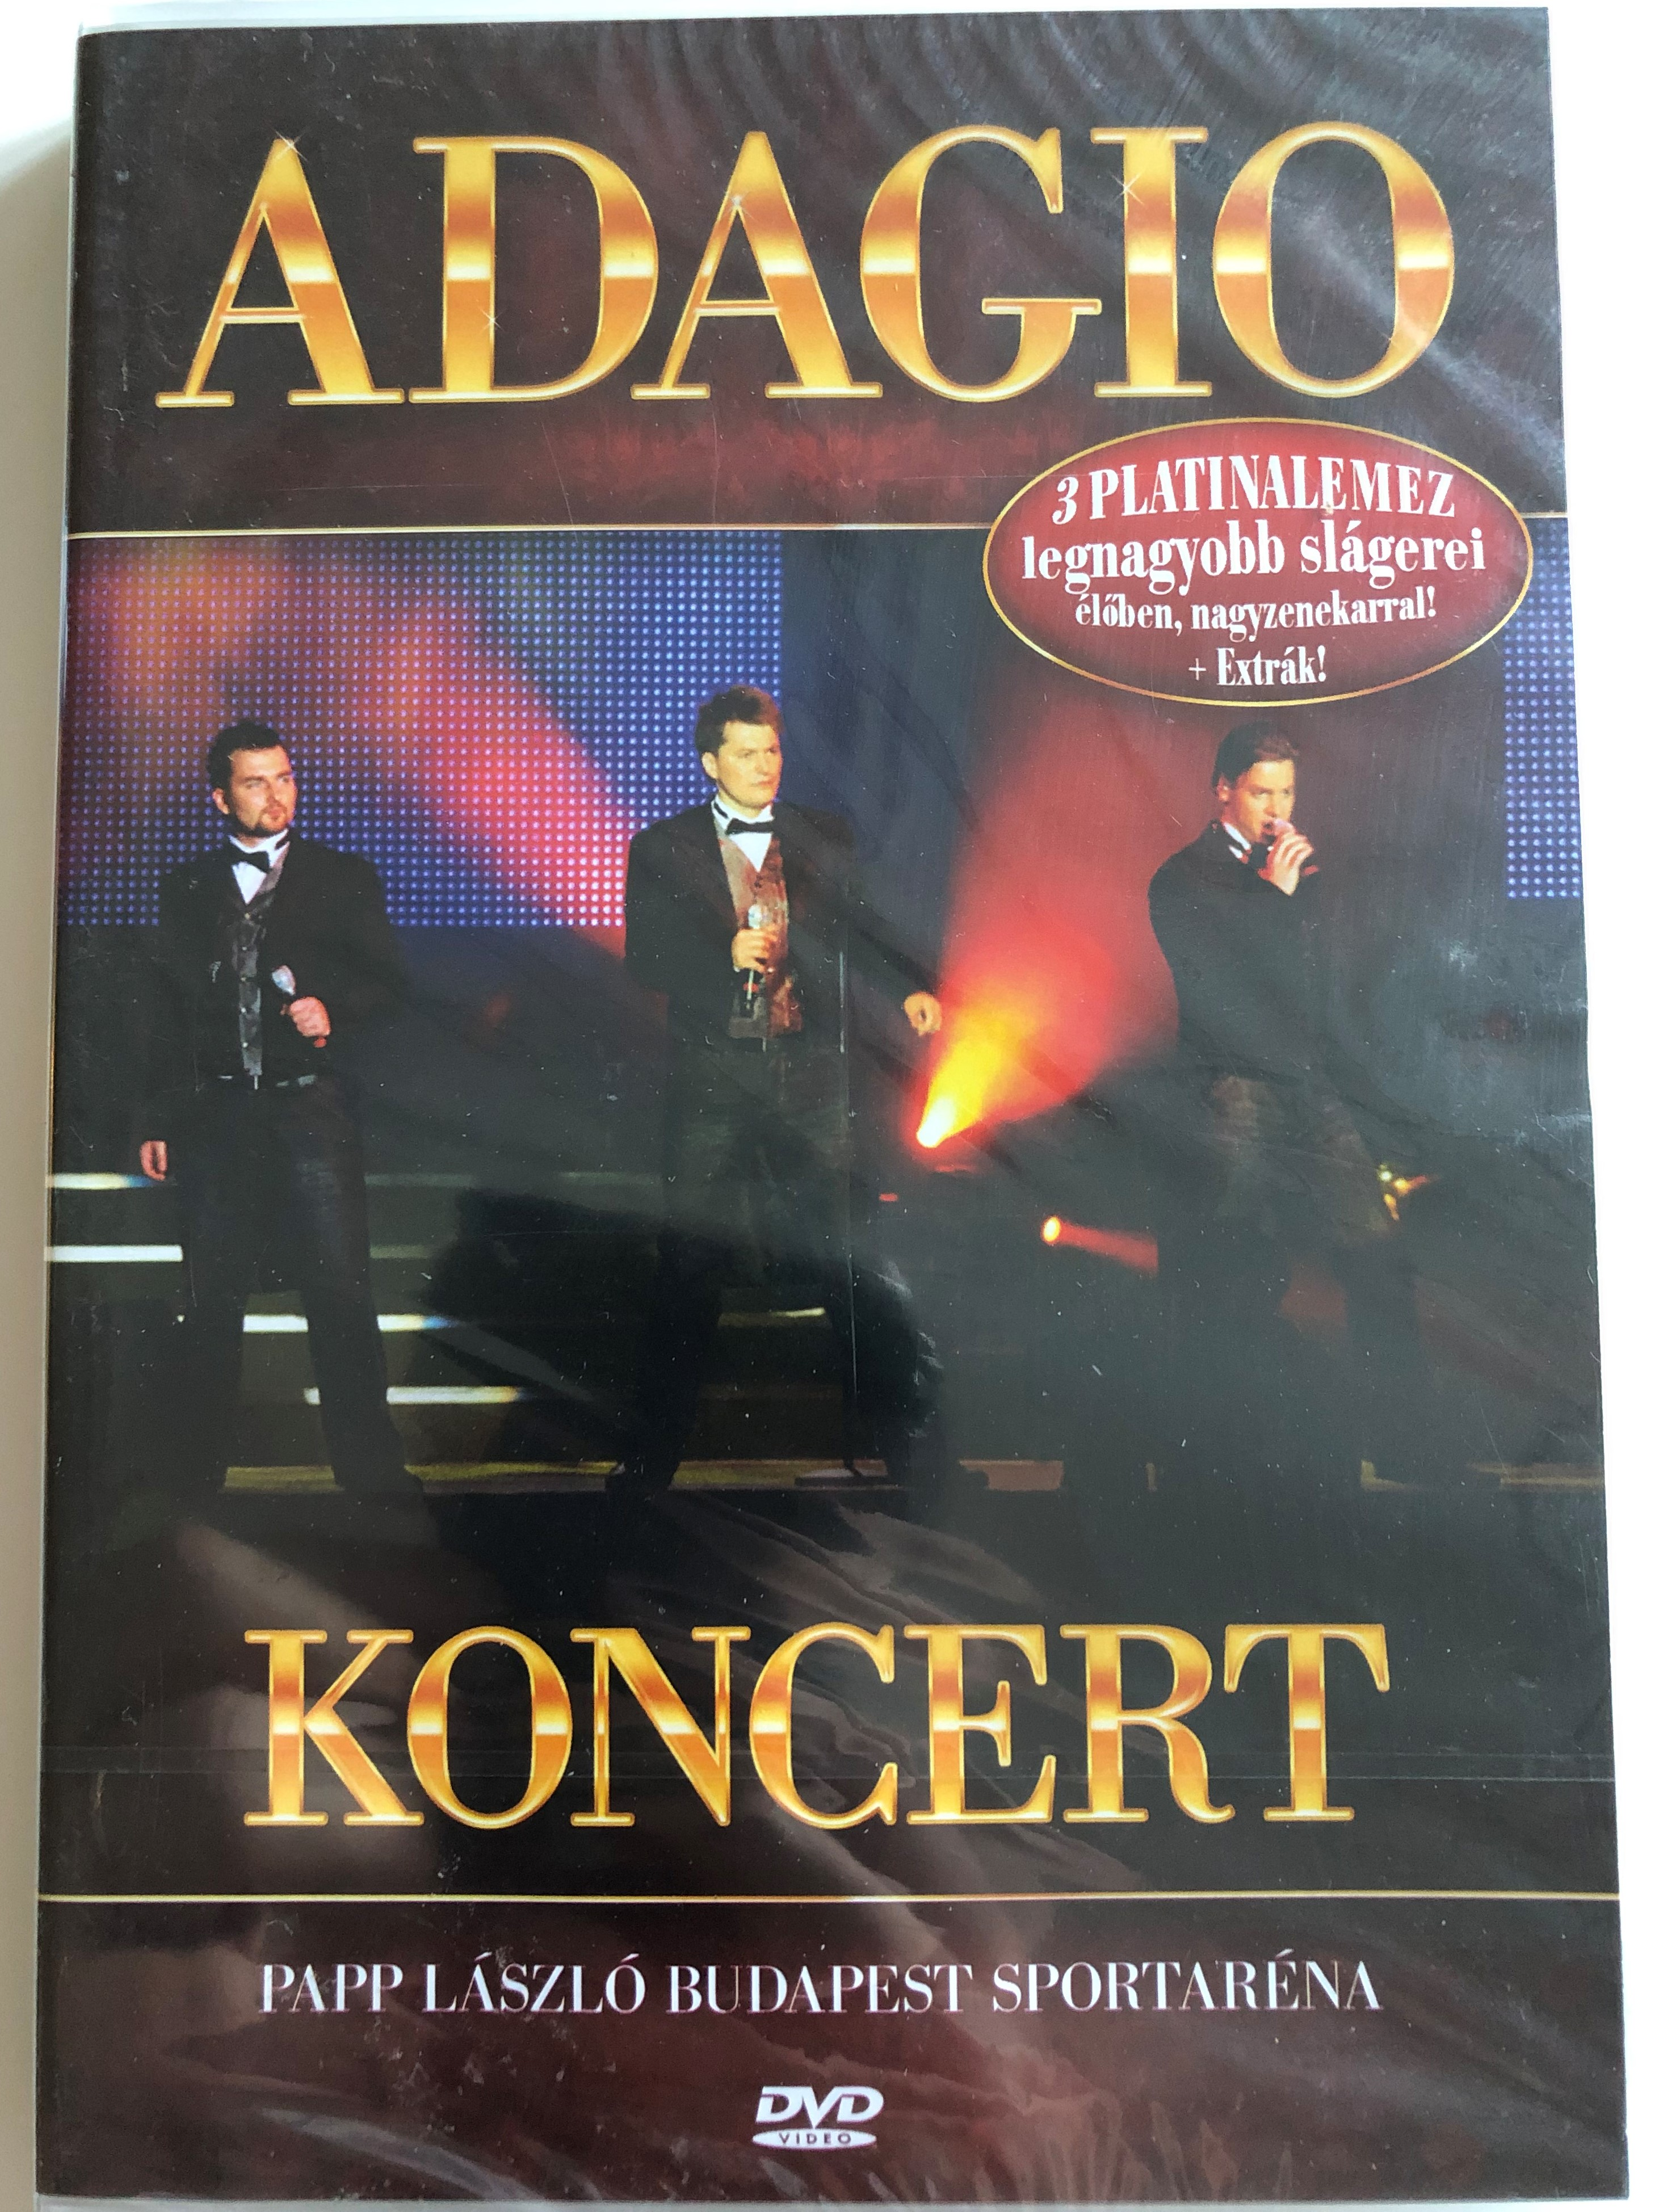 adagio-koncert-dvd-2008-papp-l-szl-budapest-sportar-na-1.jpg